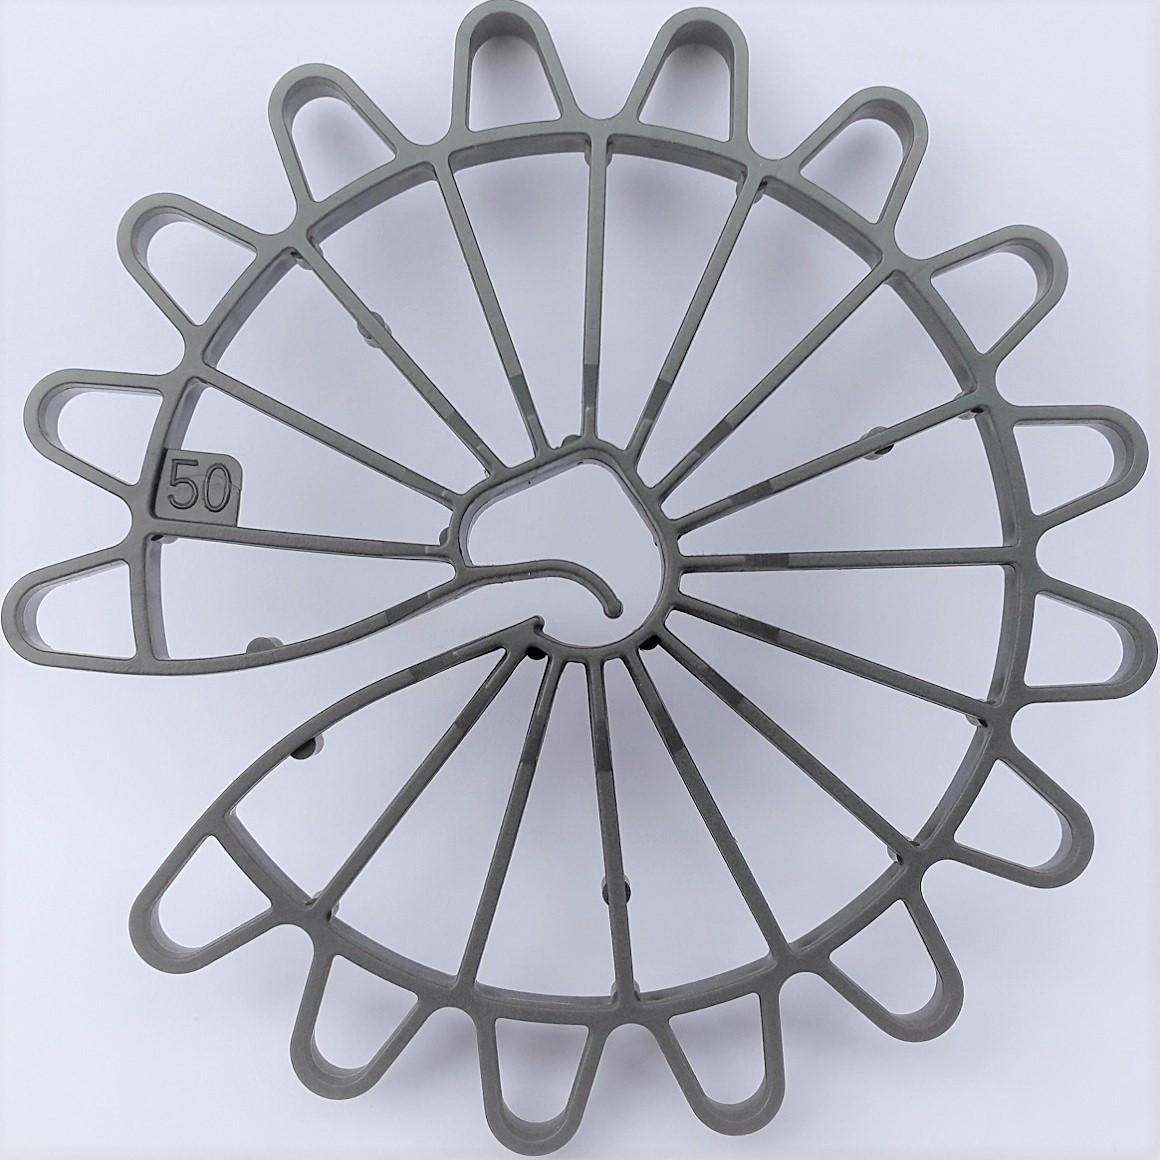 Фіксатор зірка 50 (фиксатор защитного слоя для стеновой опалубки Звездочка 50 мм), 200 в упаковке